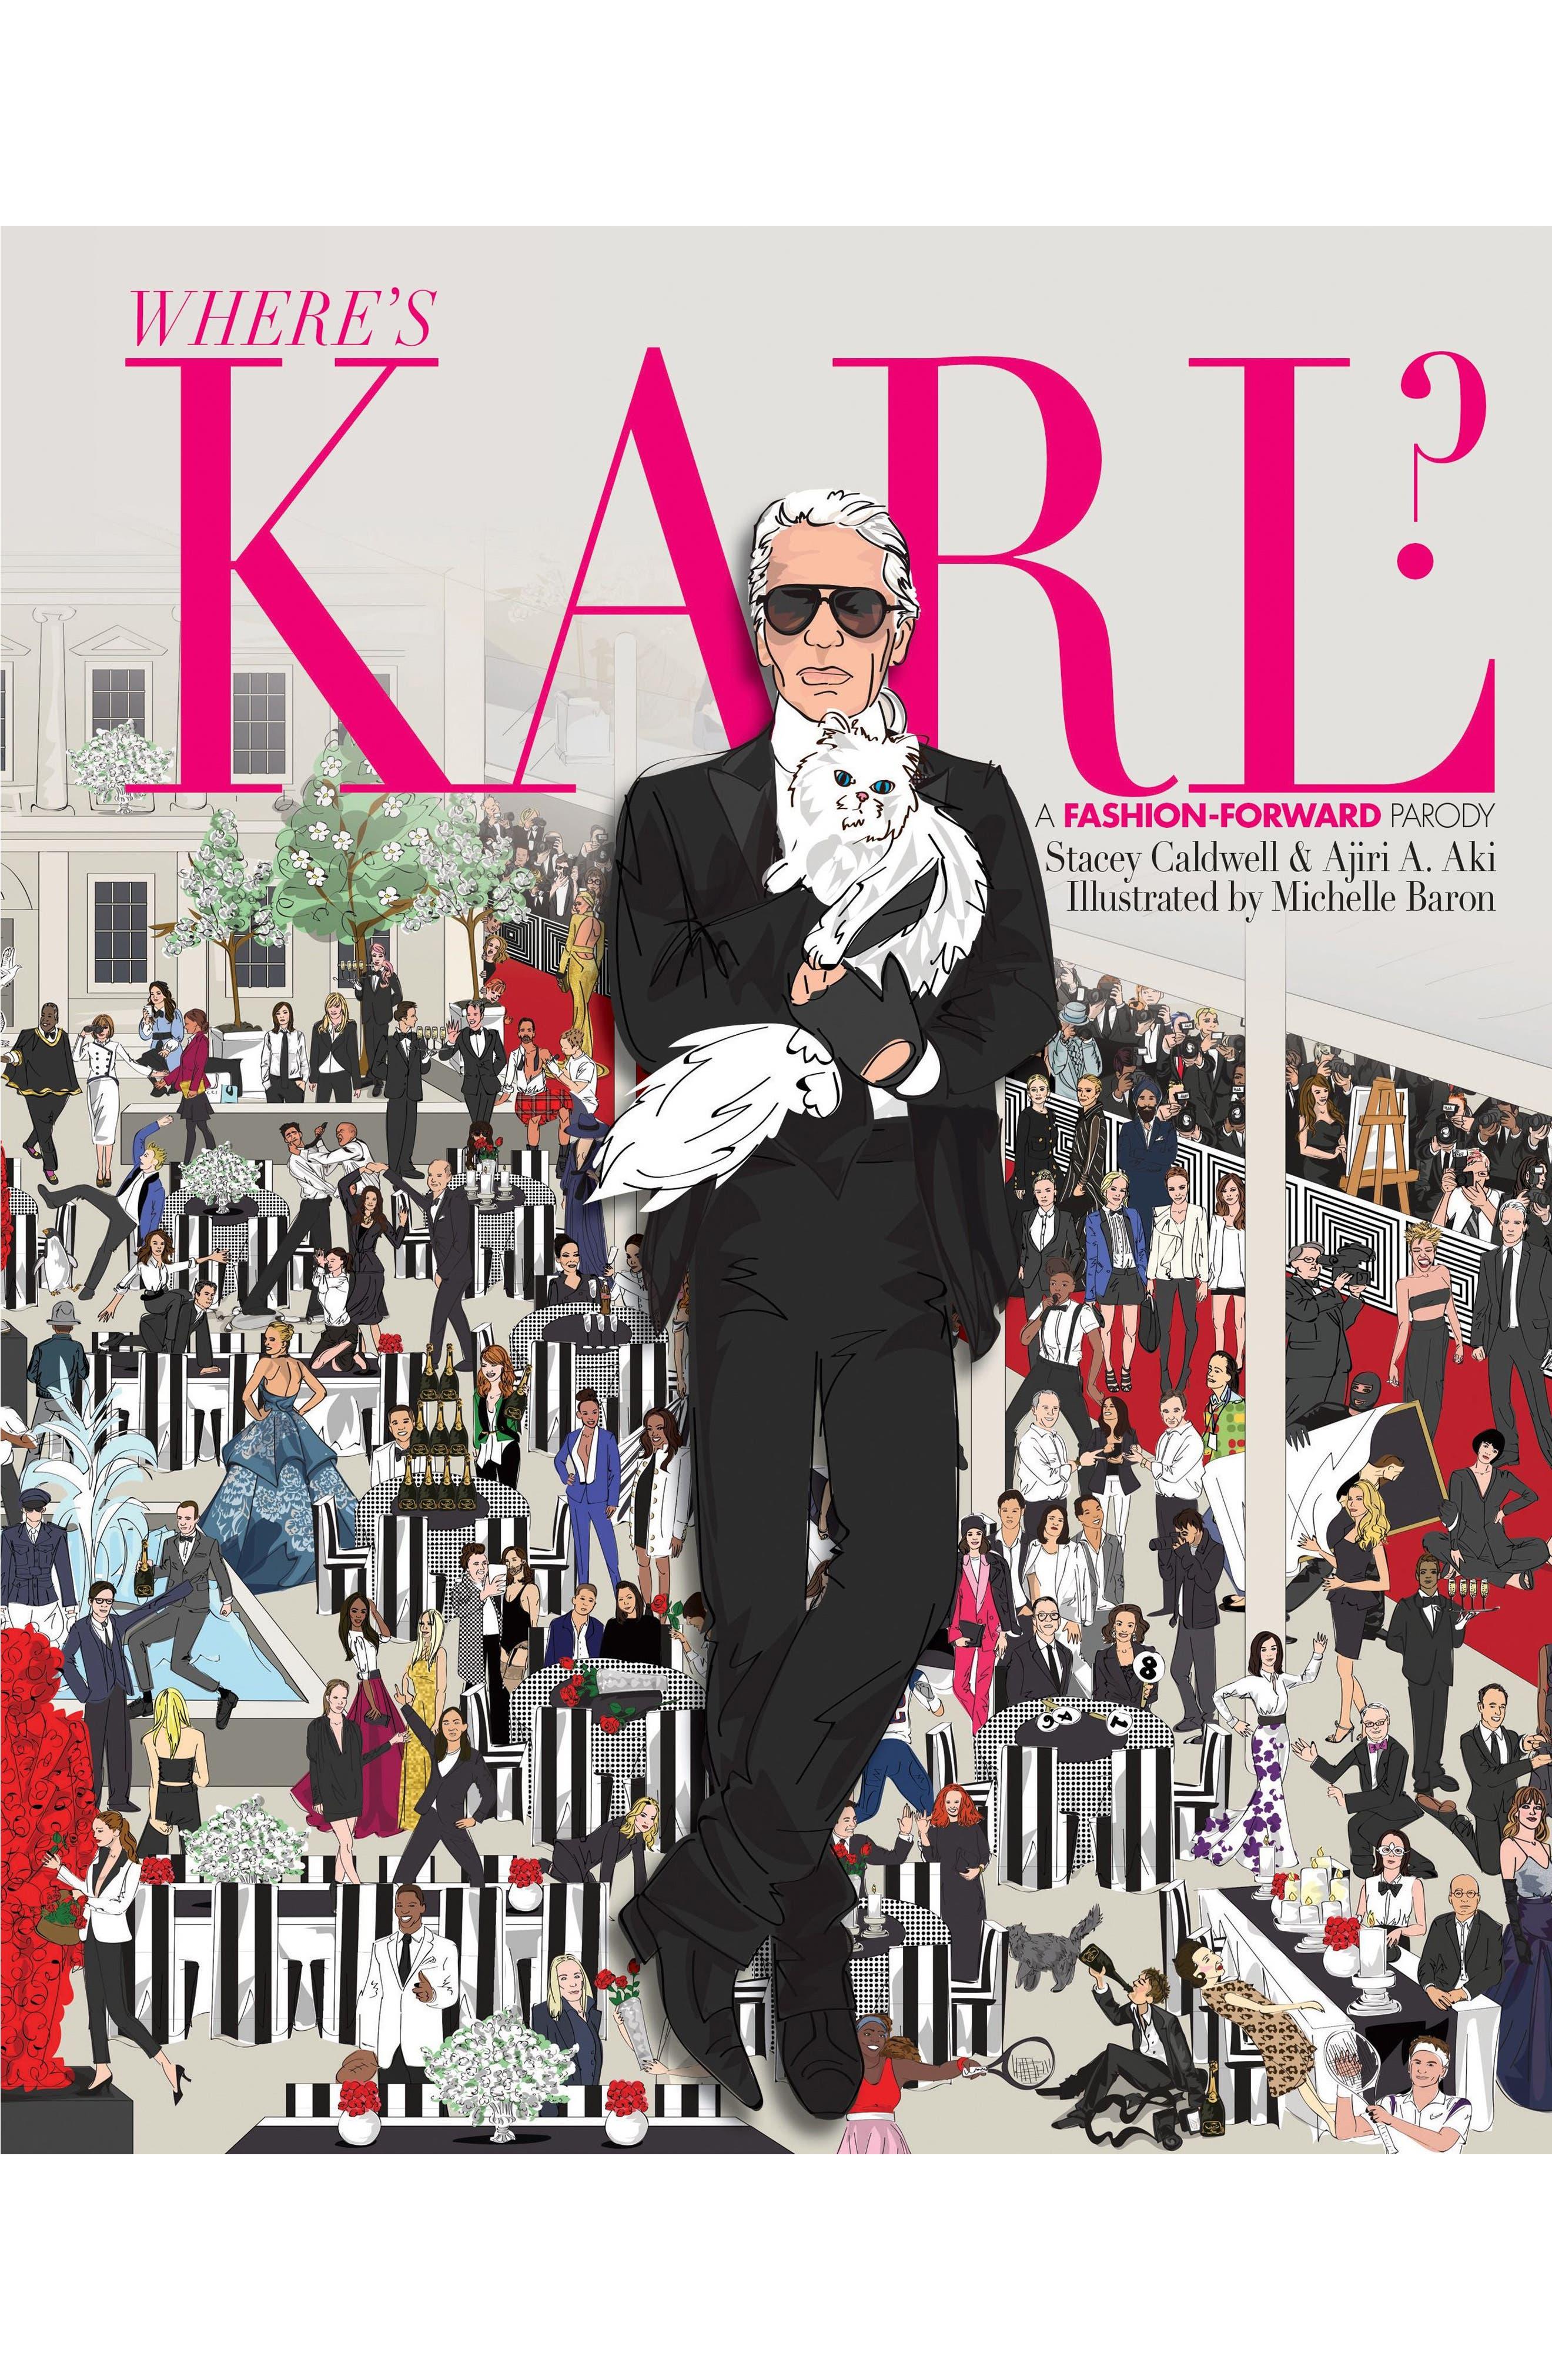 Main Image - Where's Karl?: A Fashion-Forward Parody Book